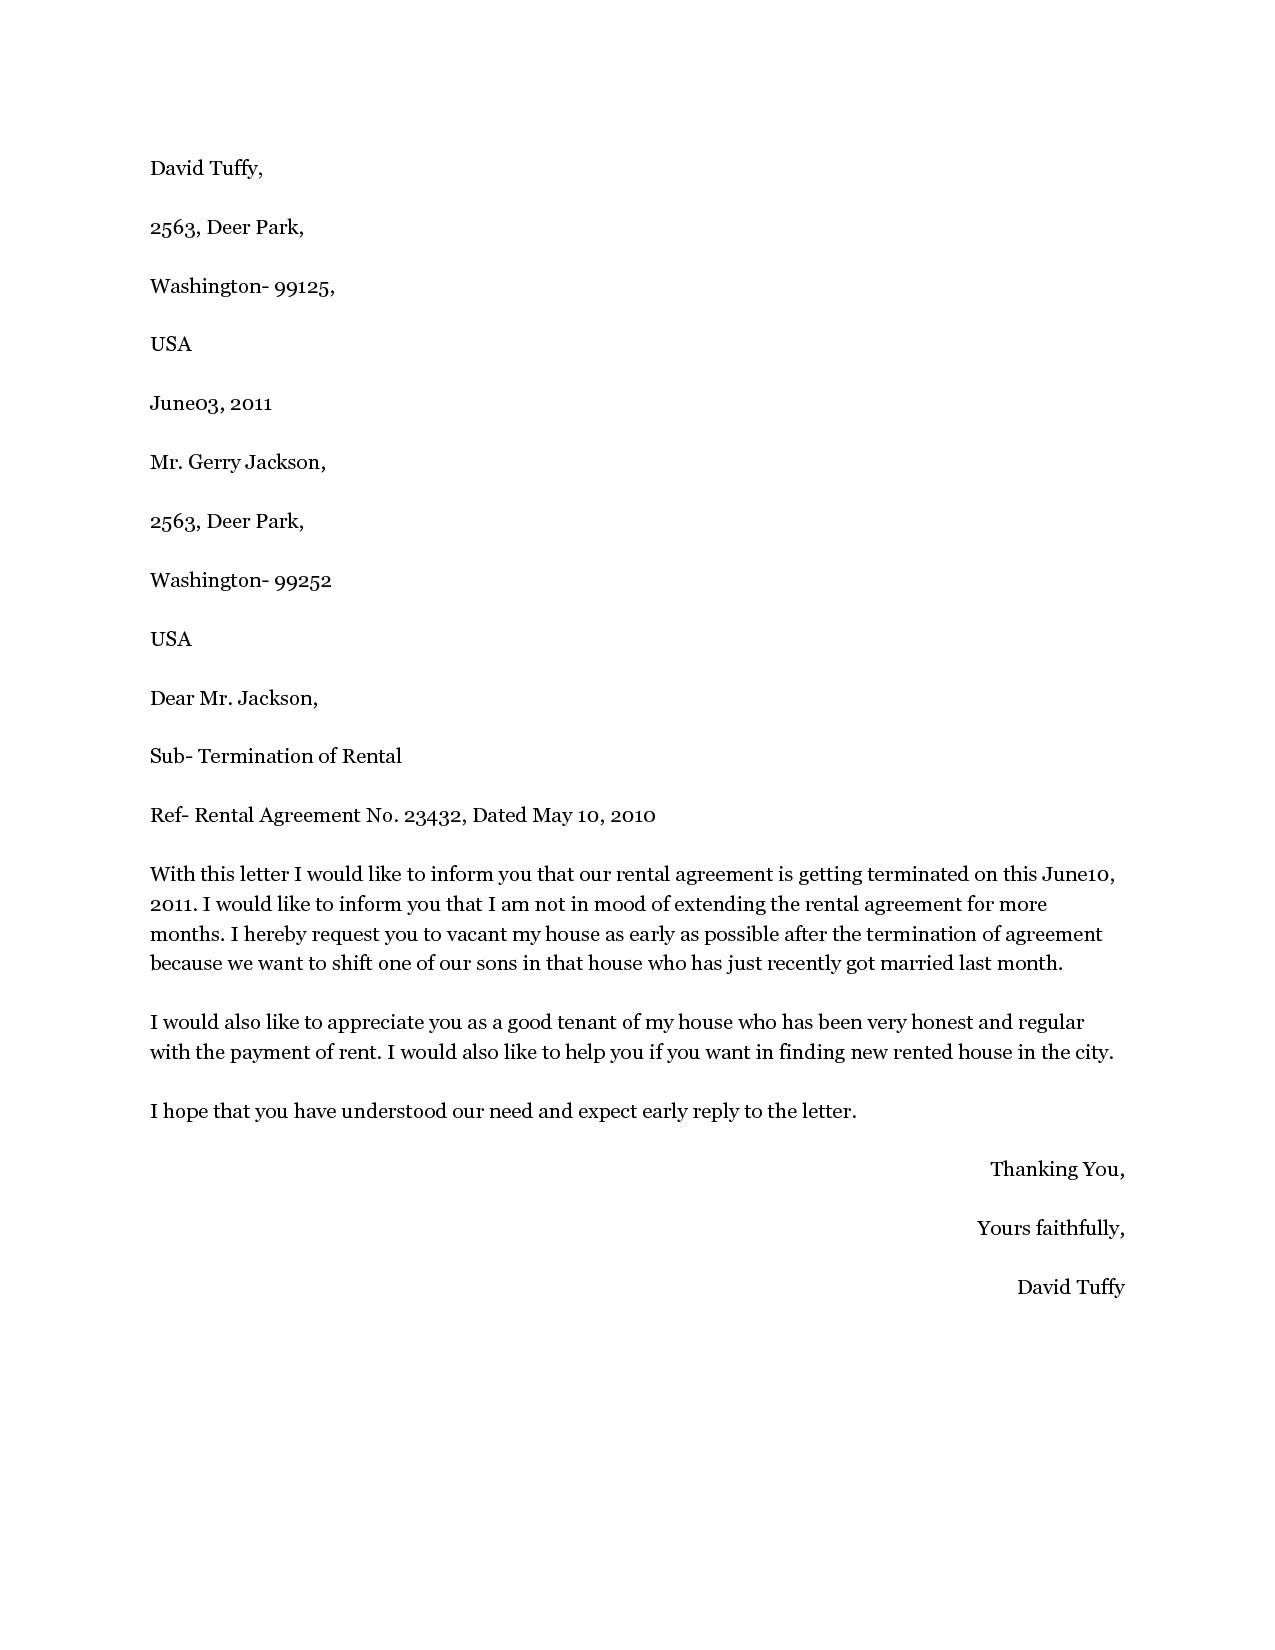 Sample letter of early termination lease contract inviview lease termination letters agreement letter sample editable al spiritdancerdesigns Images